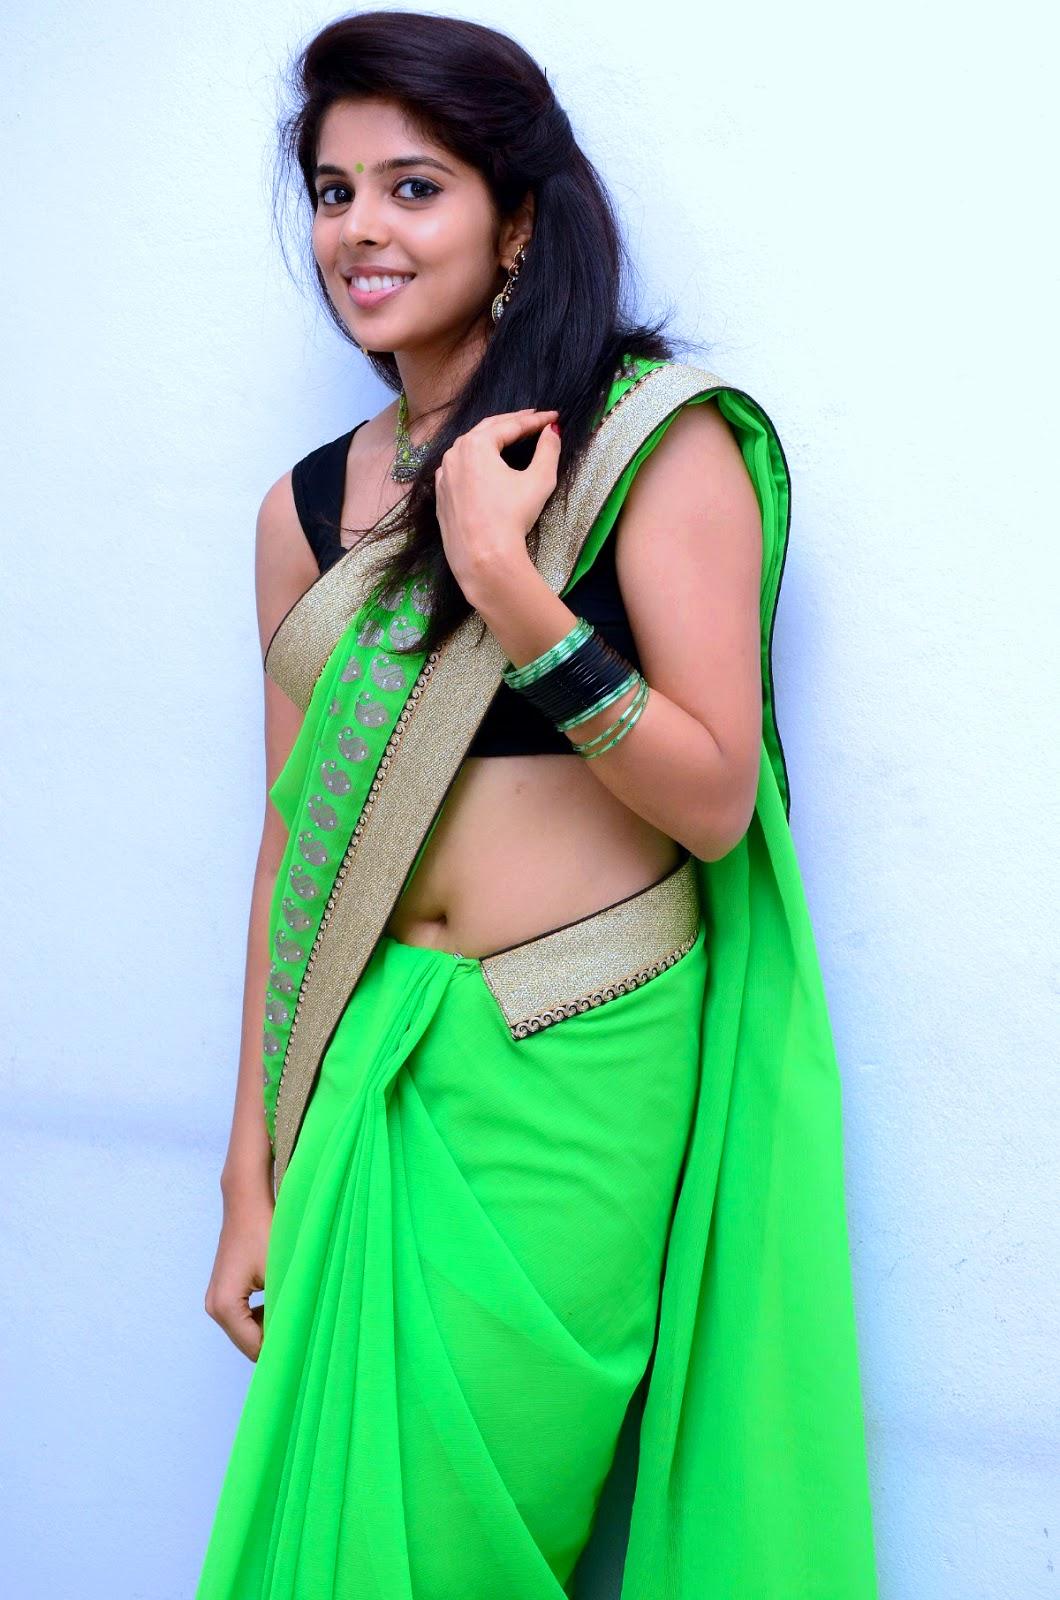 Beauty Galore Hd  Shravya Hot Navel In Green Saree-3685